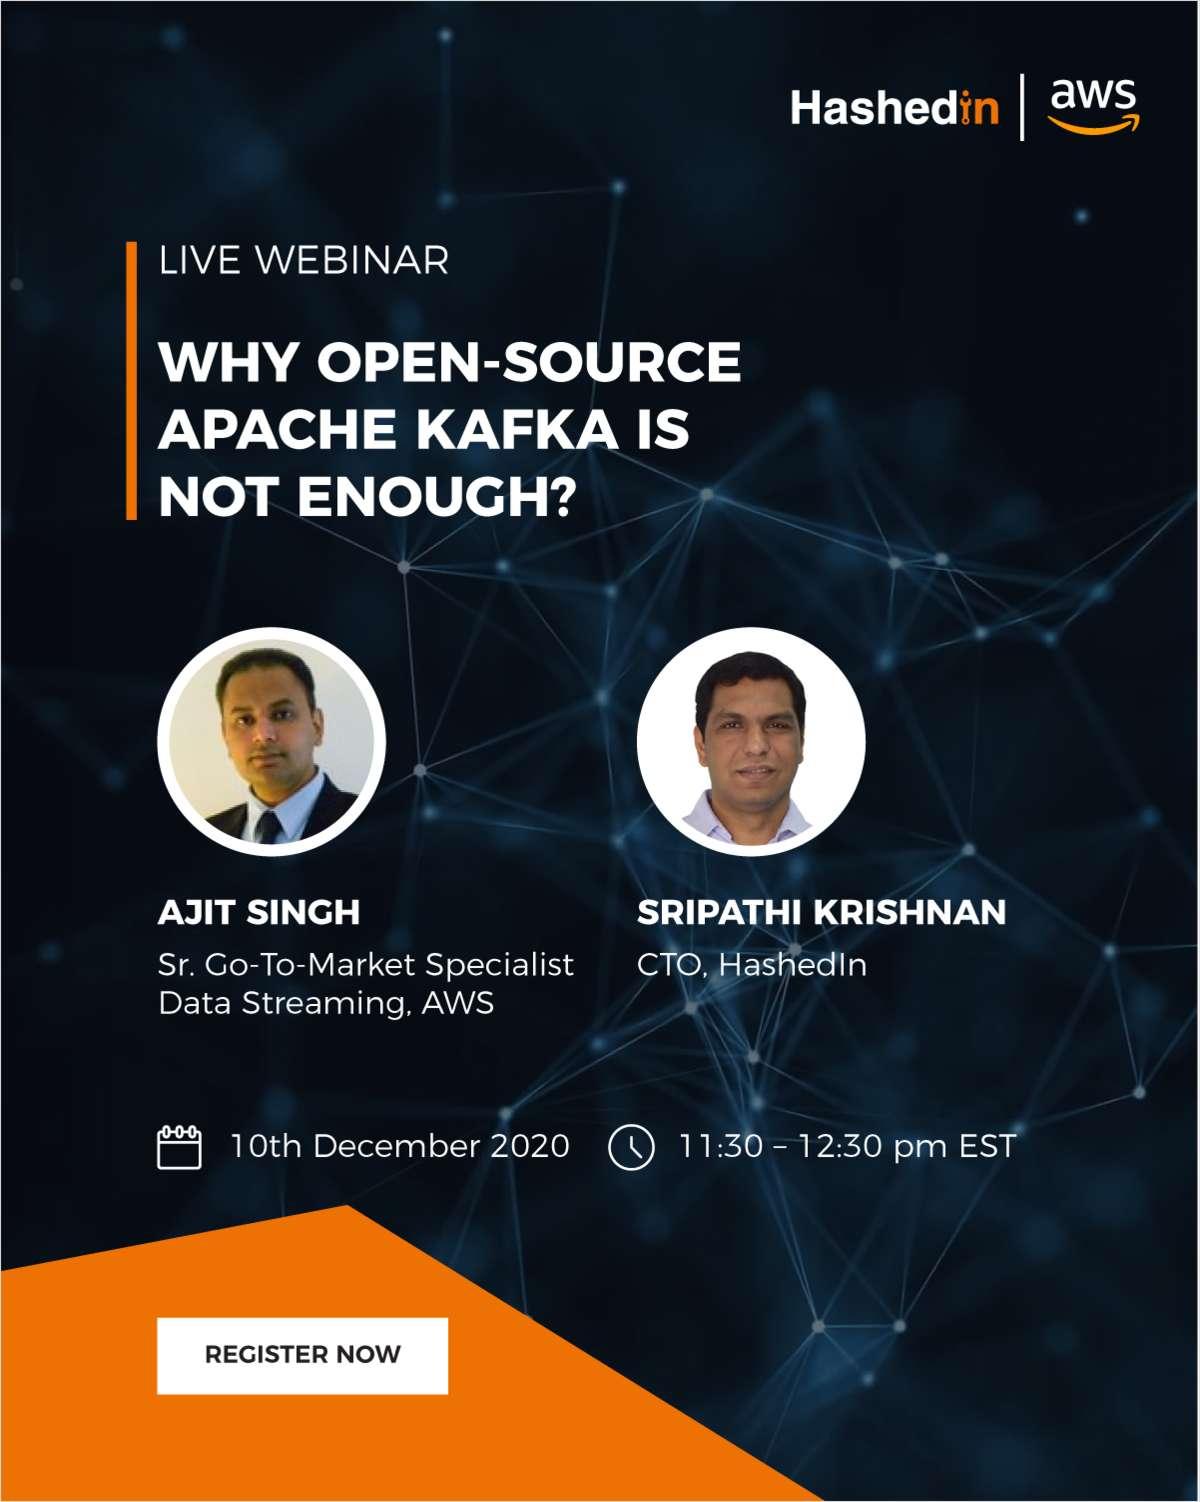 'LIVE WEBINAR: Why open-source Apache Kafka is not enough?'